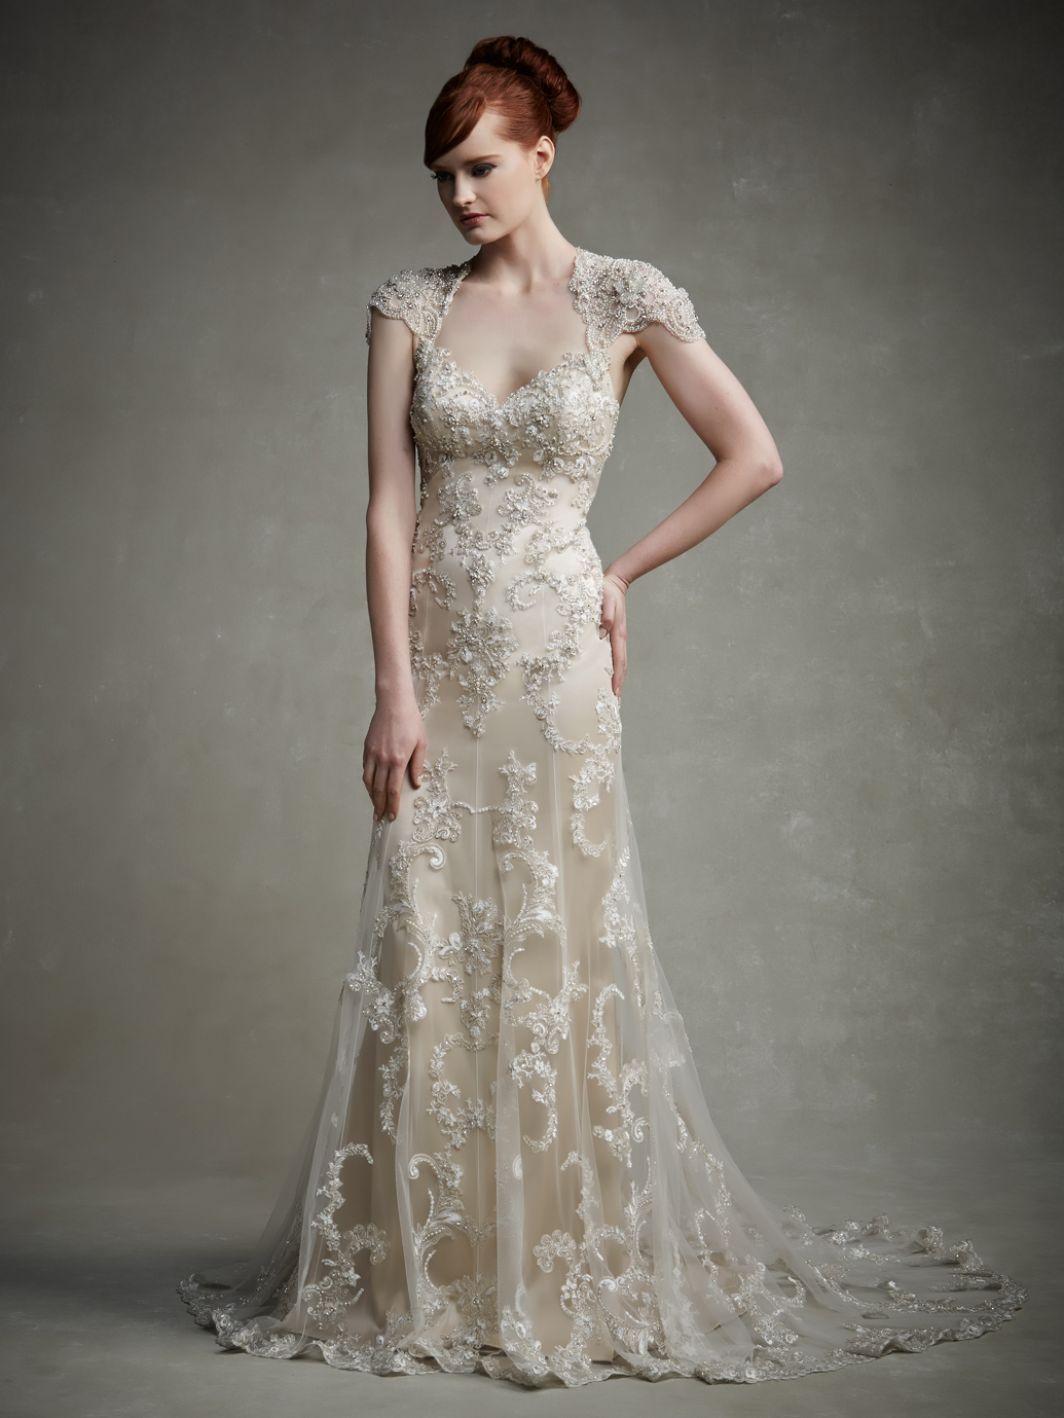 Famous wedding dresses  Pin by allison nicole on Wedding Dress Inspo  Pinterest  Wedding